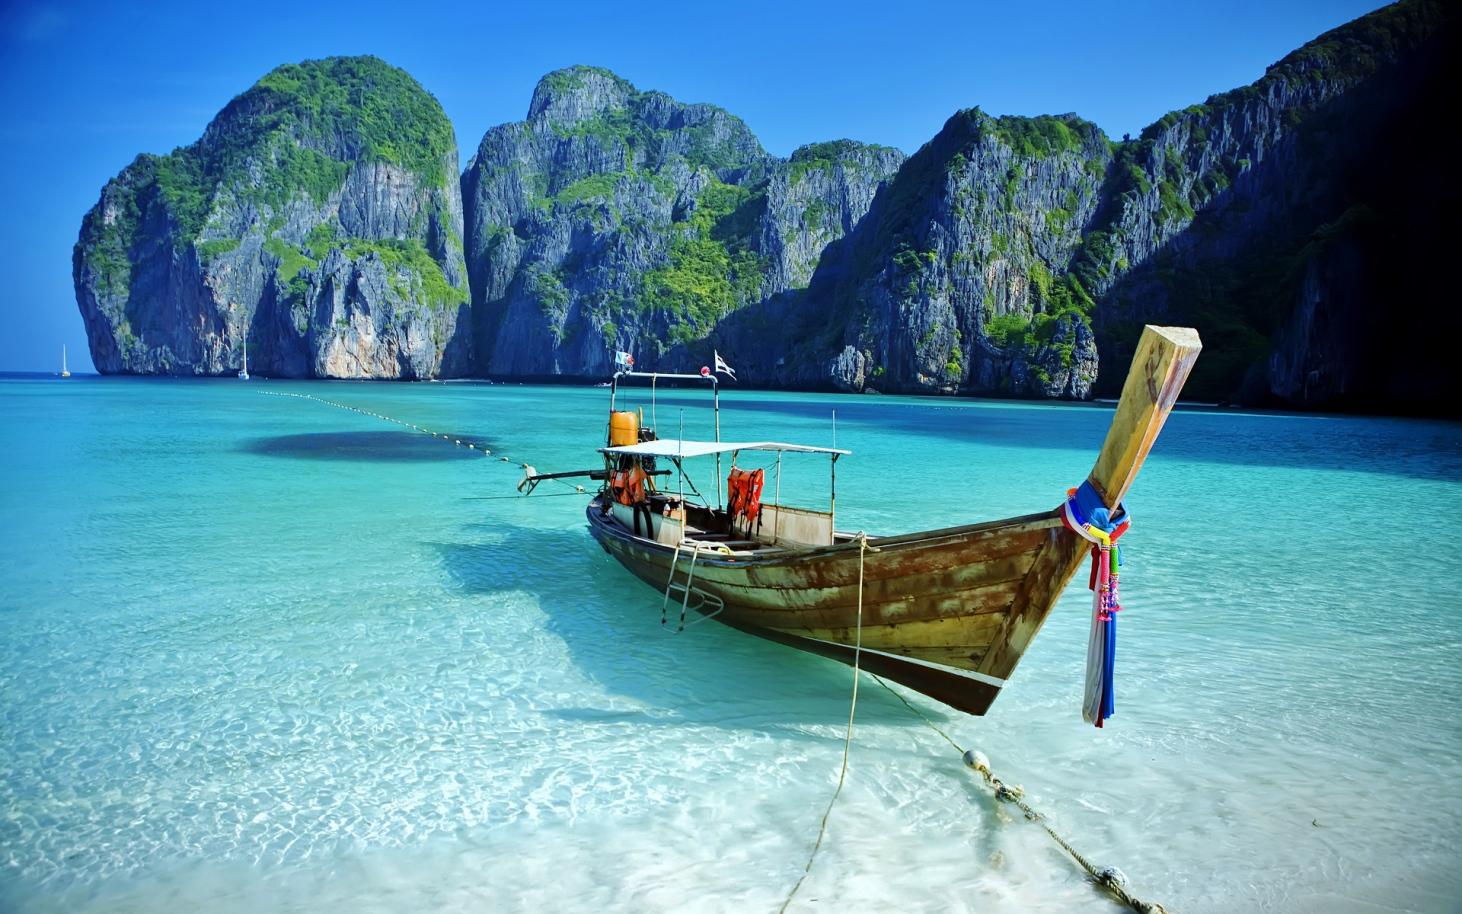 PunjabKesari, Nari, Phuket island Image ,Thailand Image